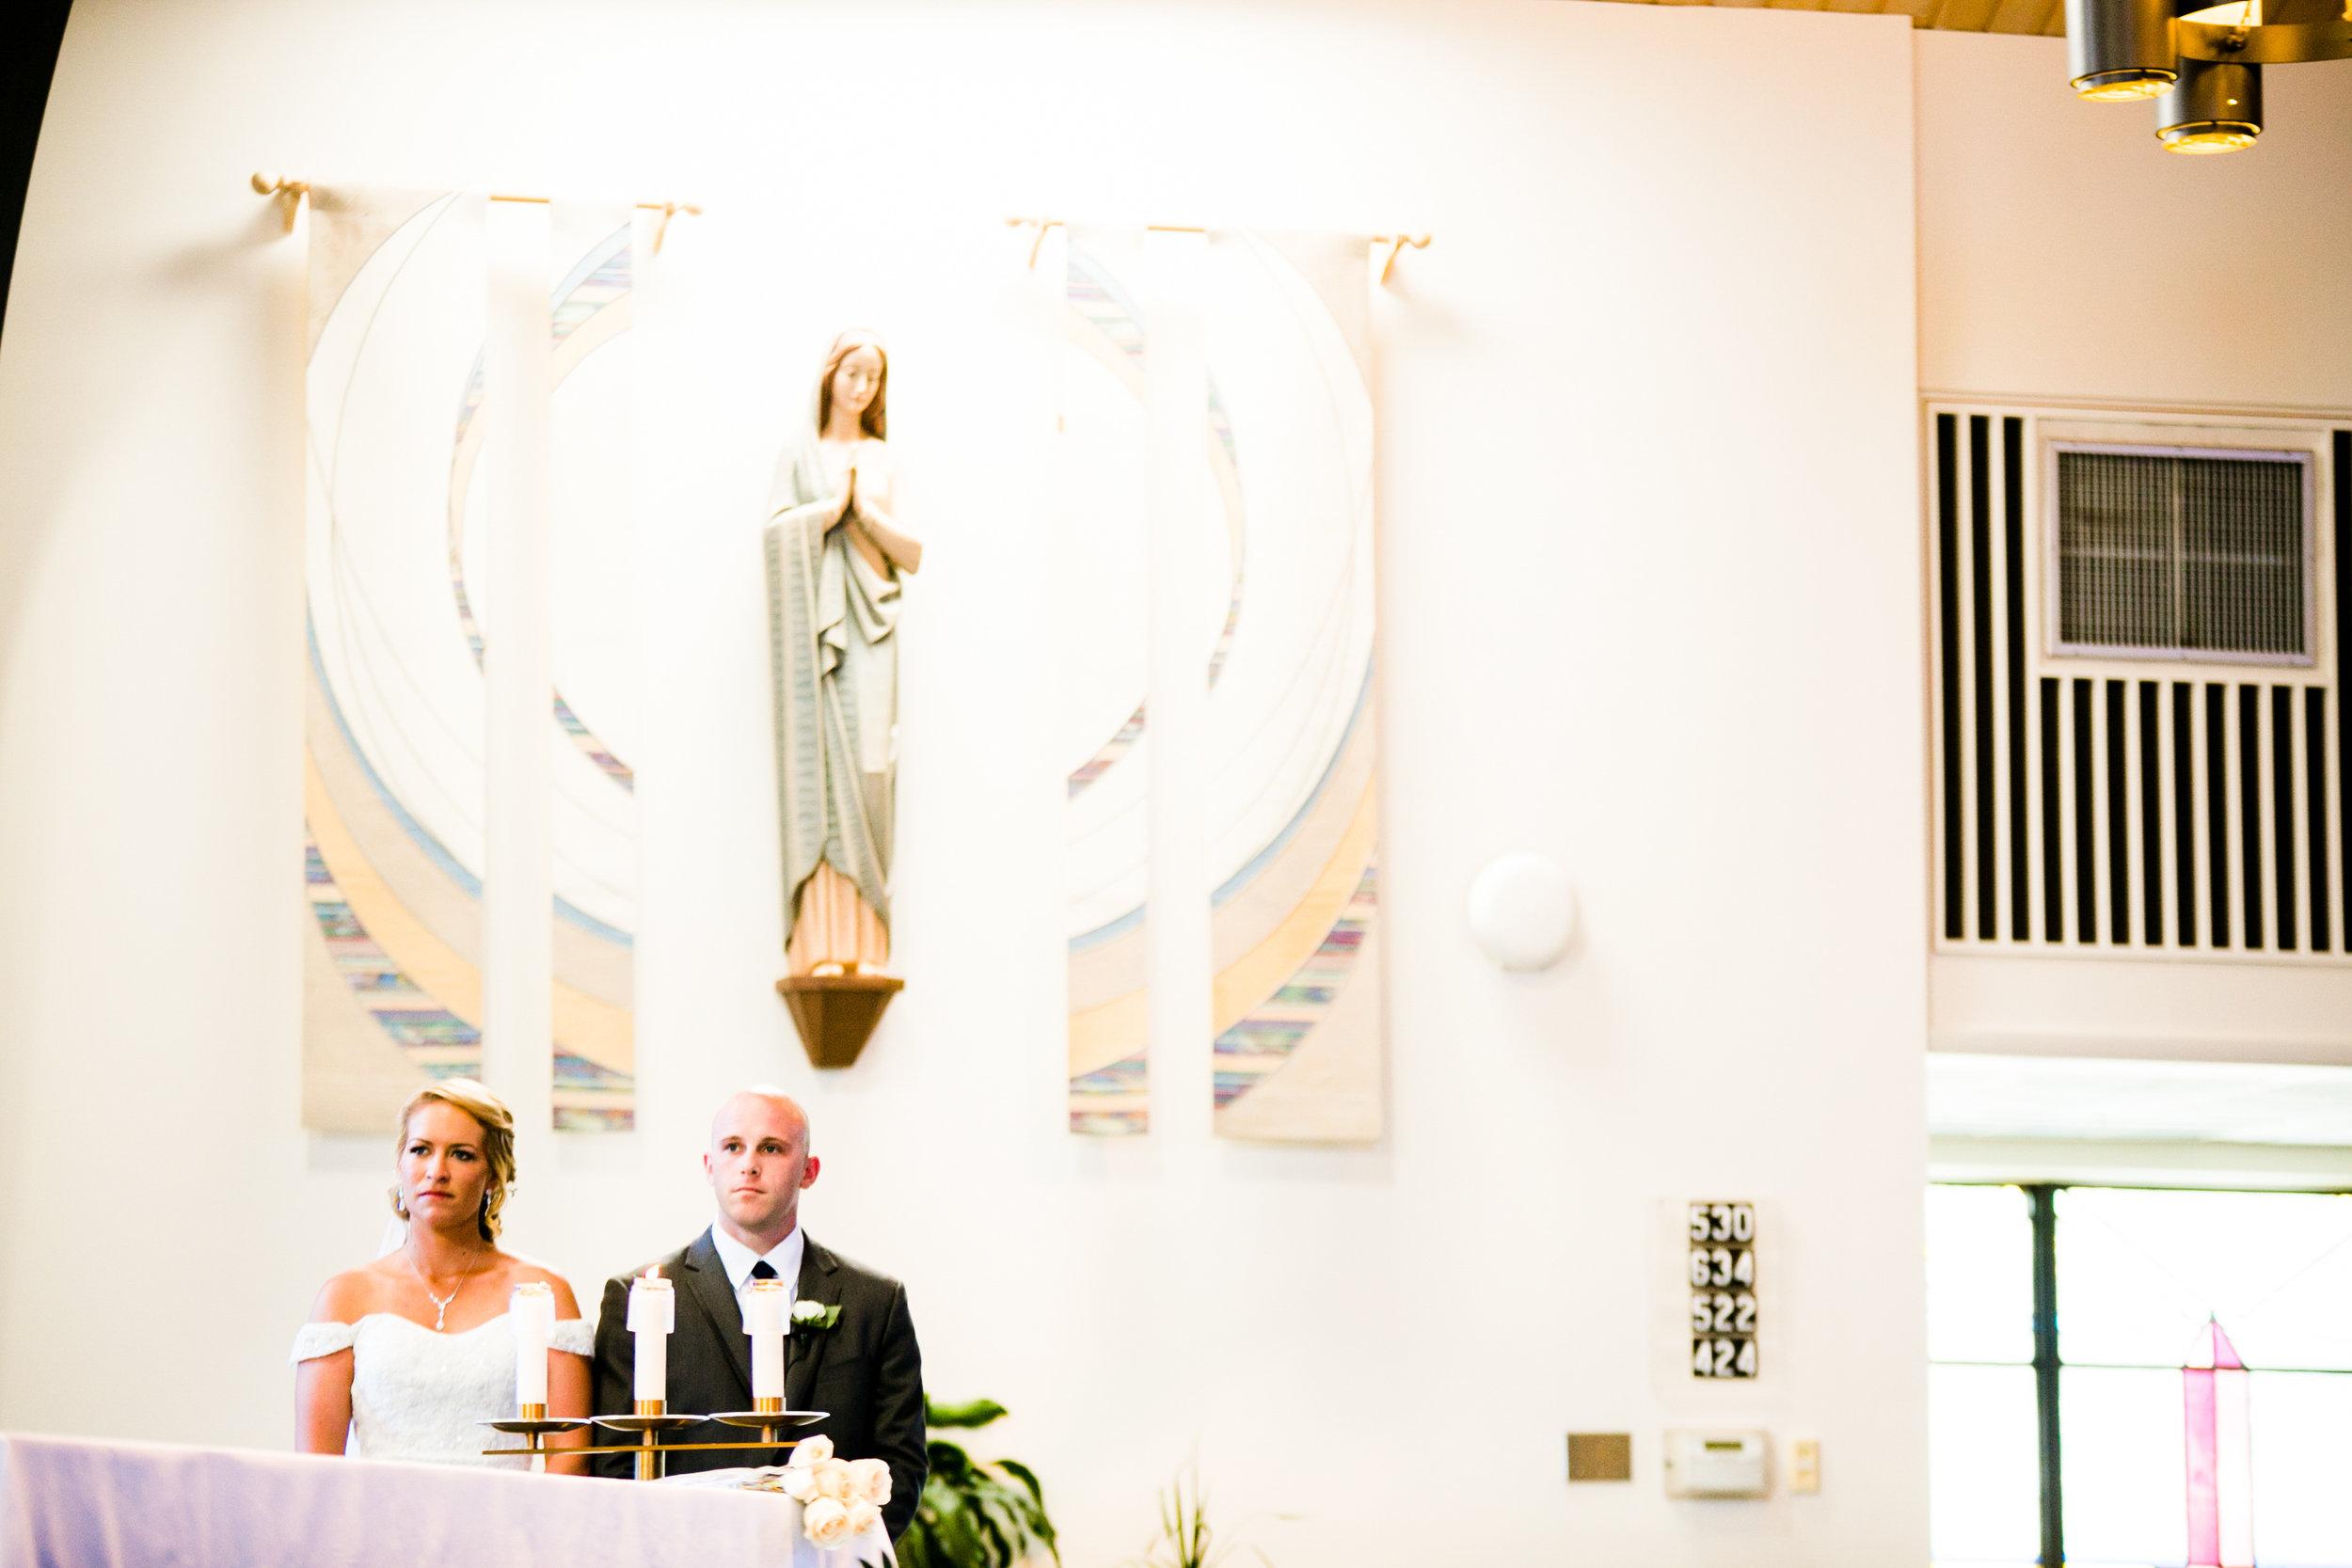 ICONA GOLDEN INN AVALON NJ WEDDING PHOTOGRAPHY  - 044.jpg